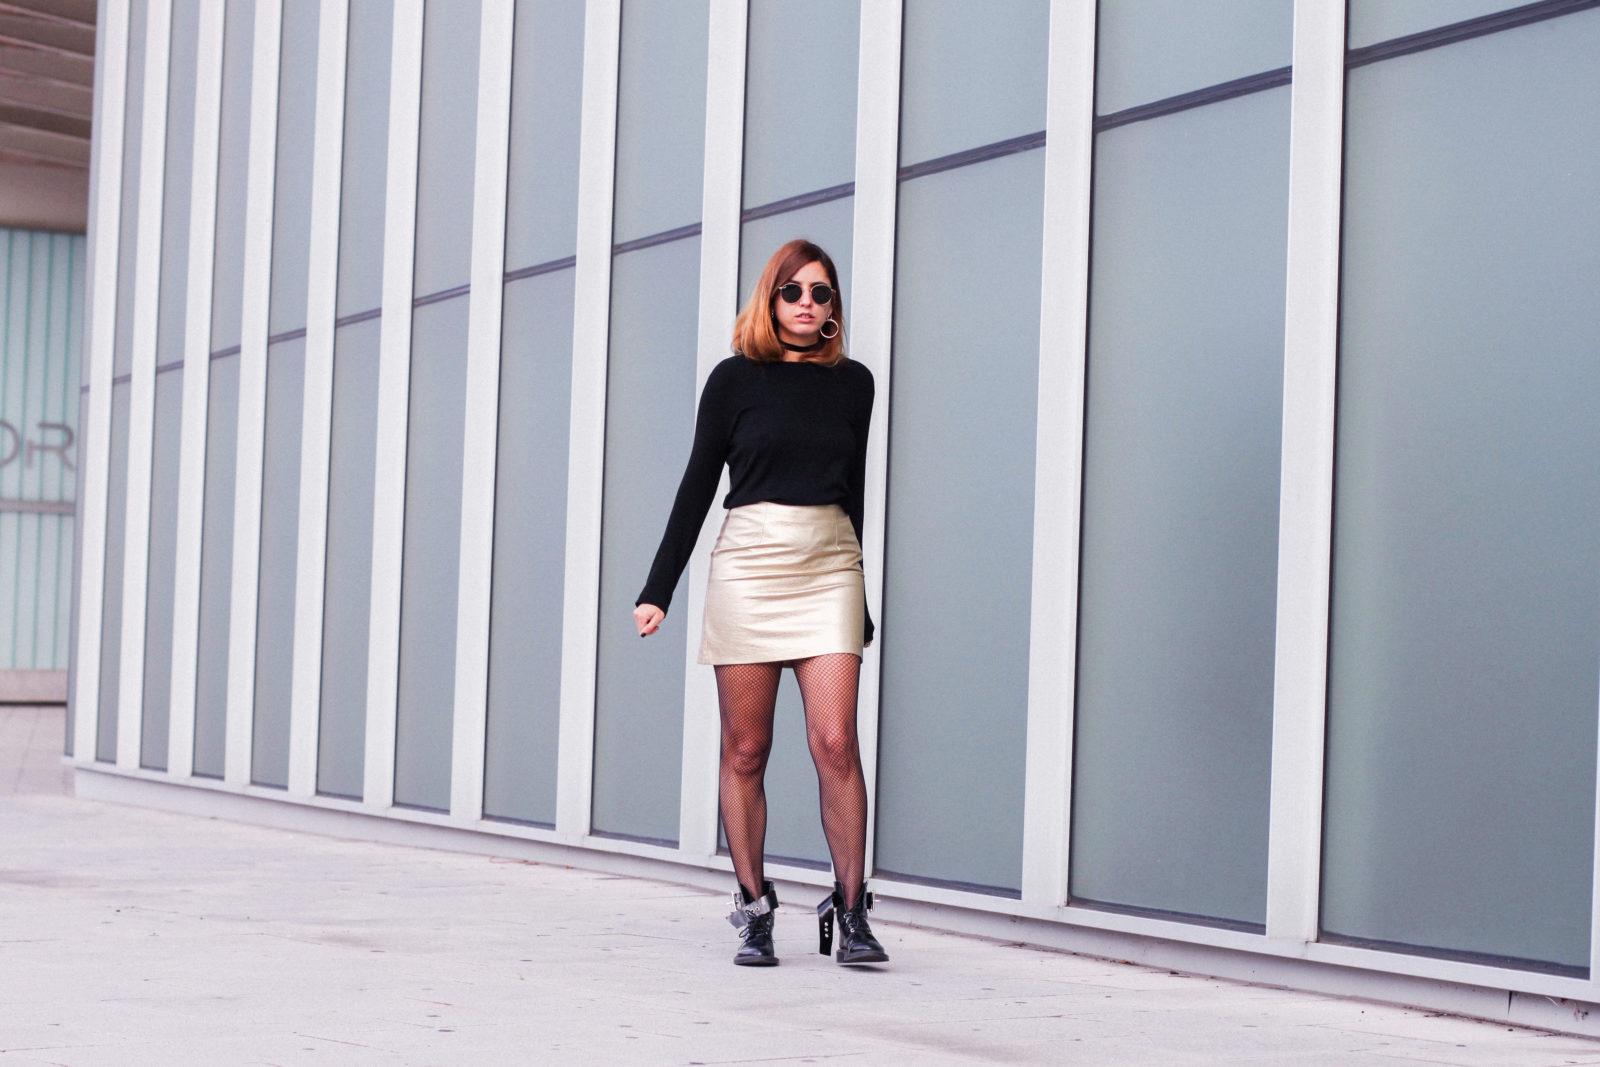 falda_dorada_shein_metalizado_medias_de_rejilla_choker_donkeycool_street_style_trends_2016-36